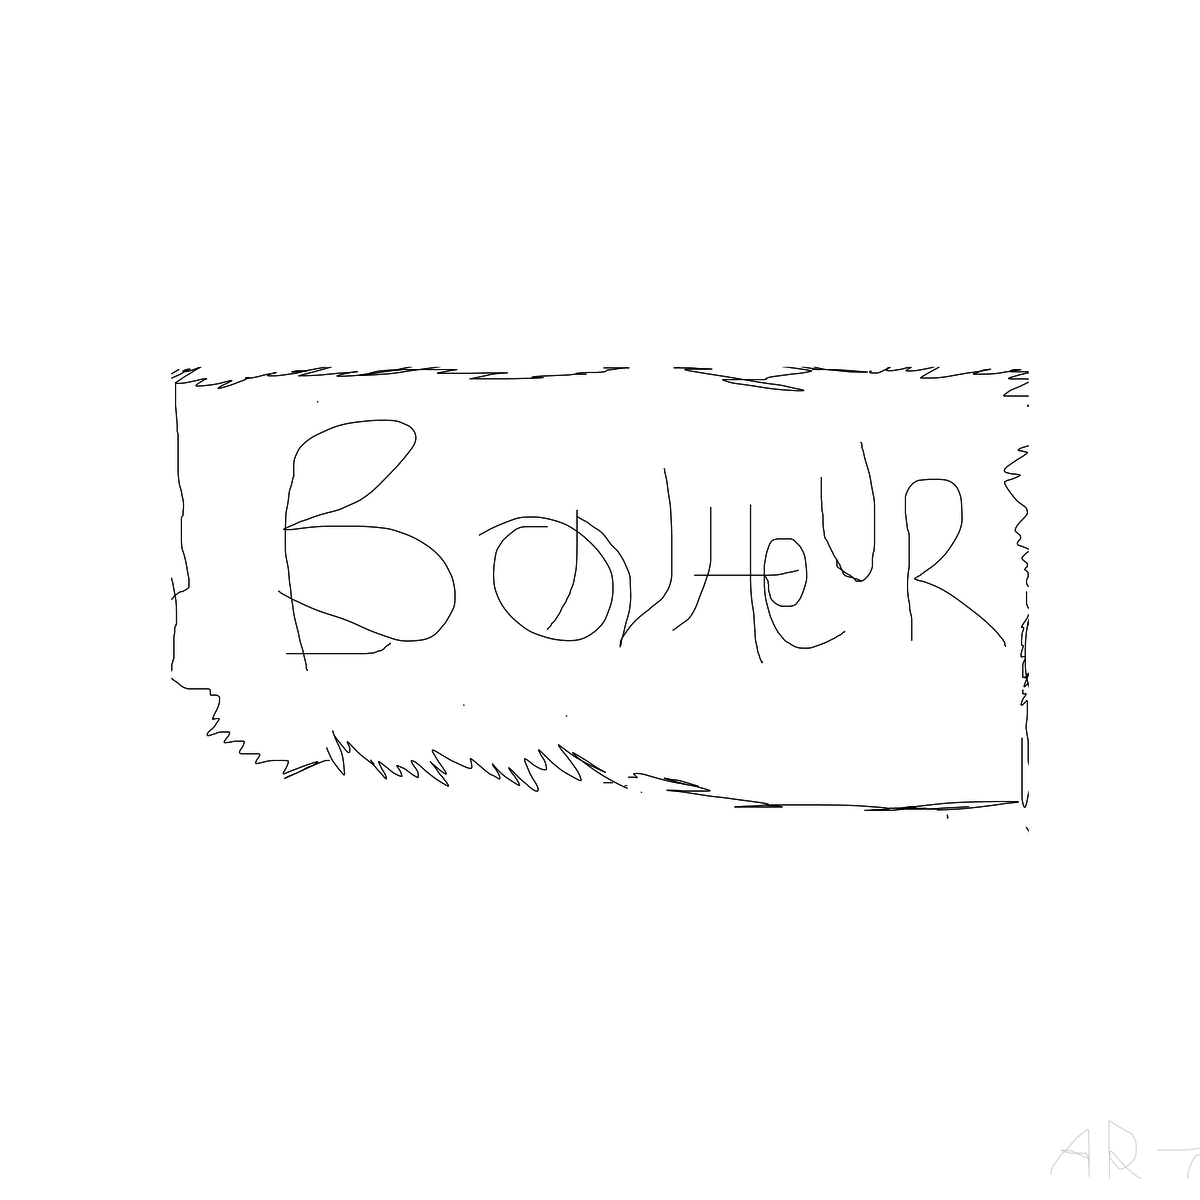 BAAAM drawing#18533 lat:43.3044853210449200lng: 5.3922977447509770